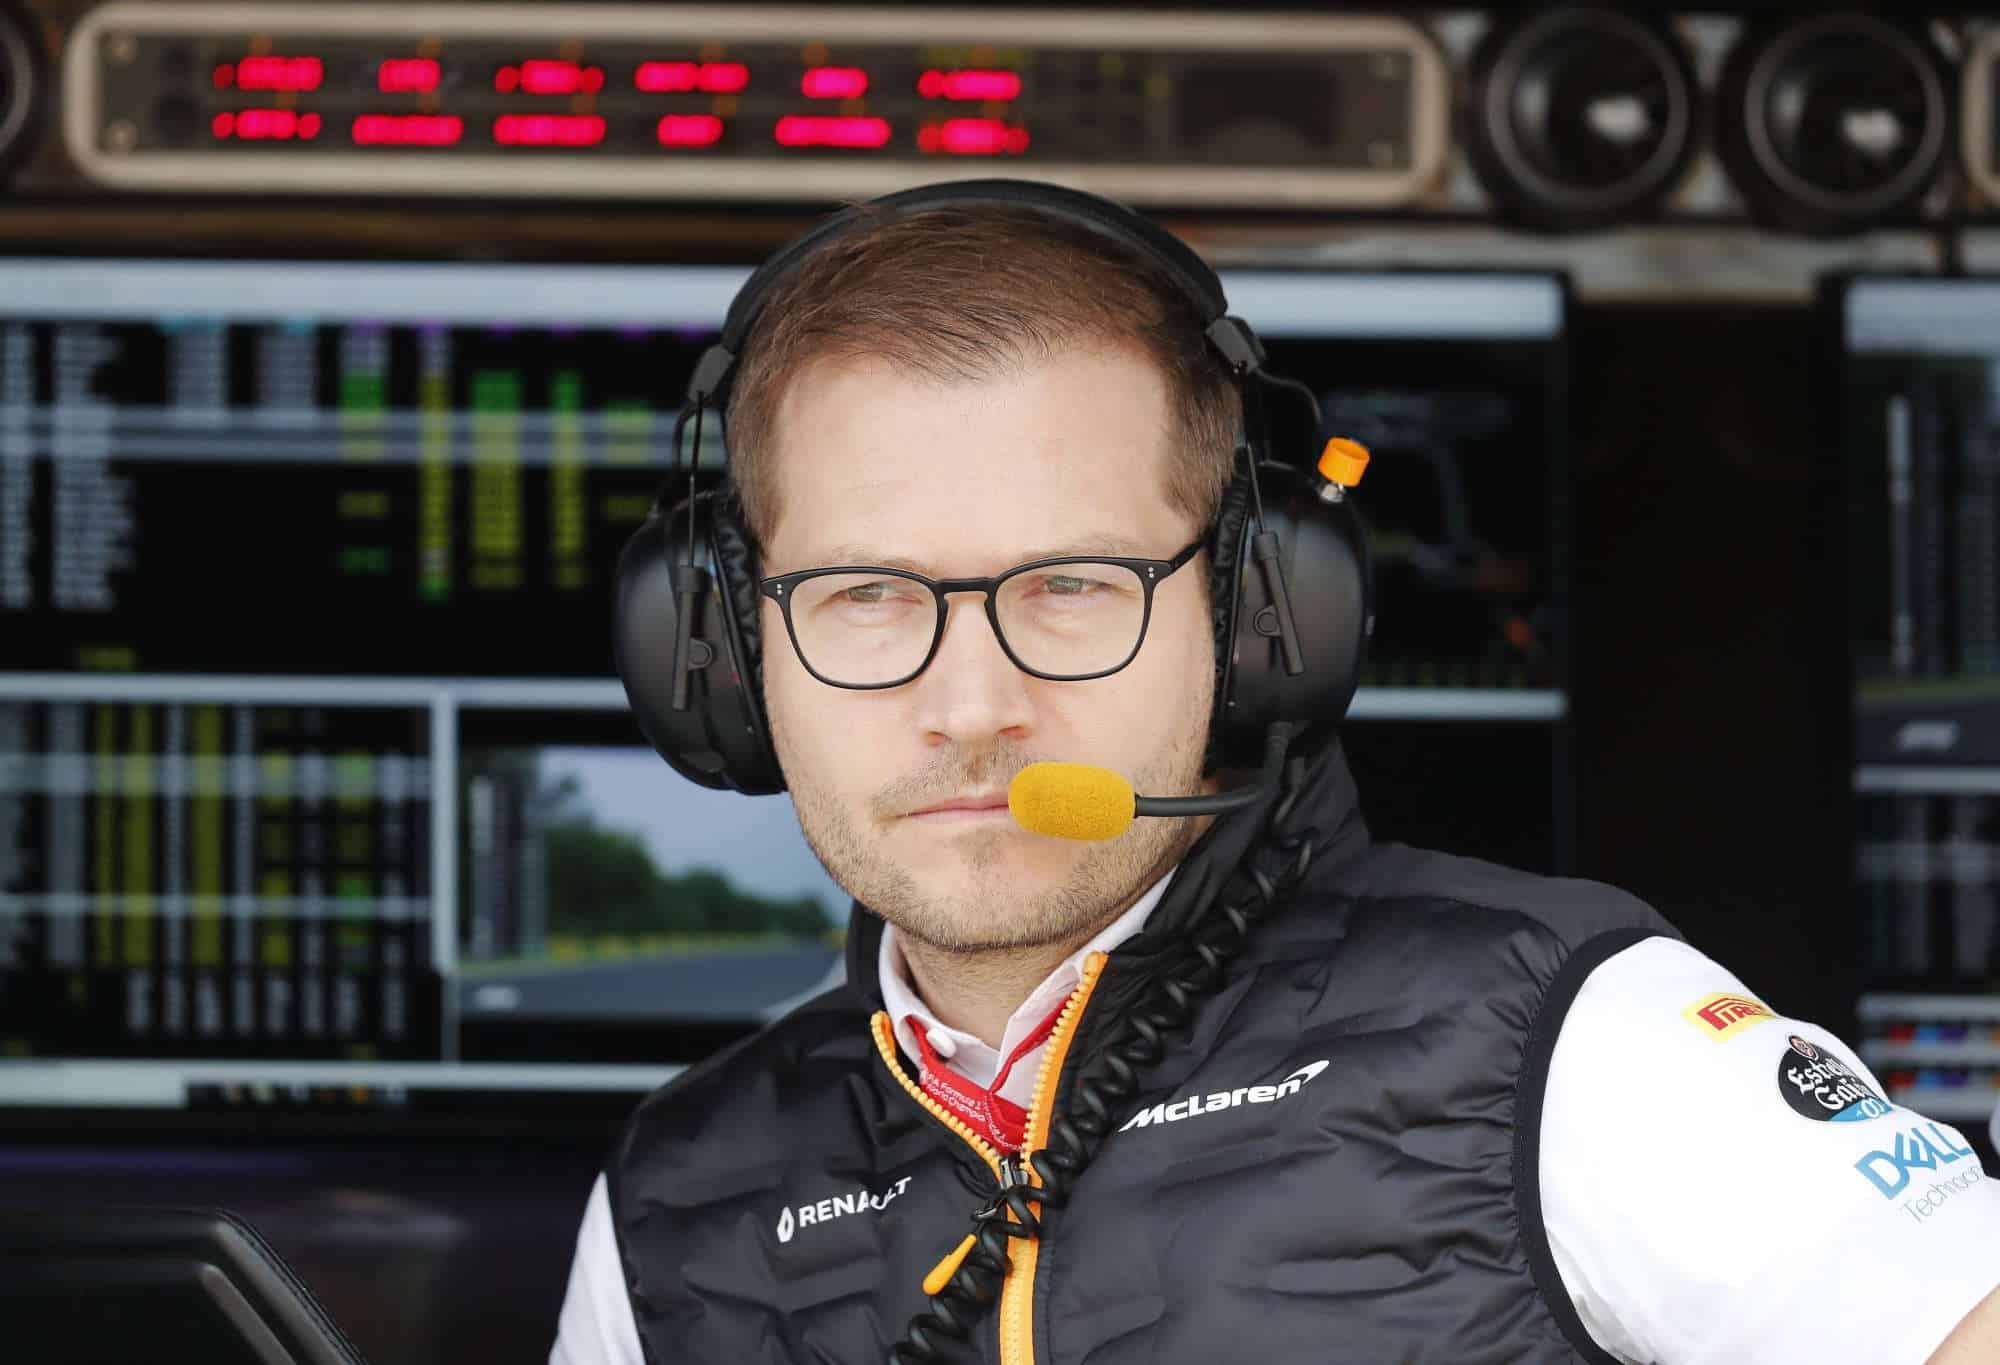 2019 Hungarian Grand Prix Saturday Andreas Seidl Photo McLaren